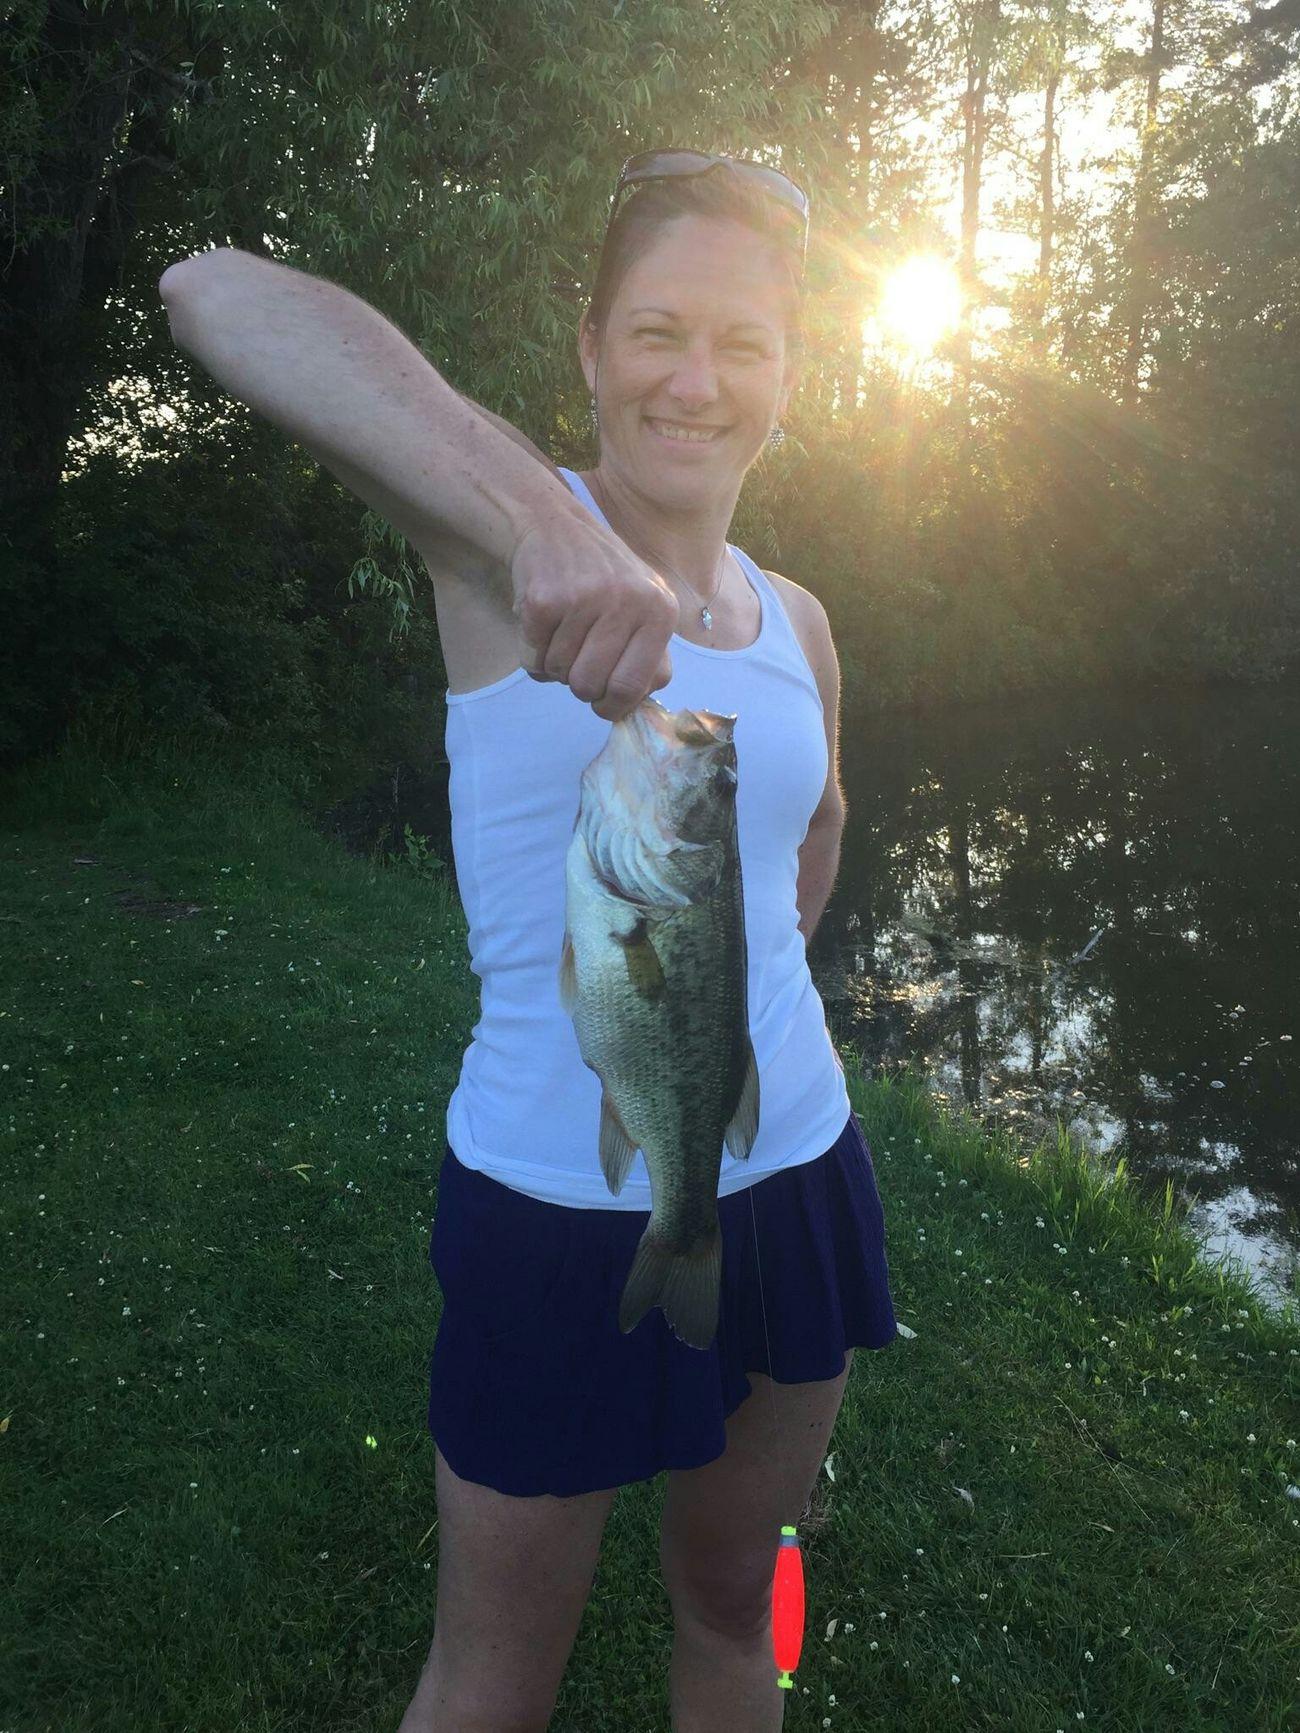 Gone Fishing Fishing Check This Out Largemouthbass Enjoying Life Summer ☀ Bass